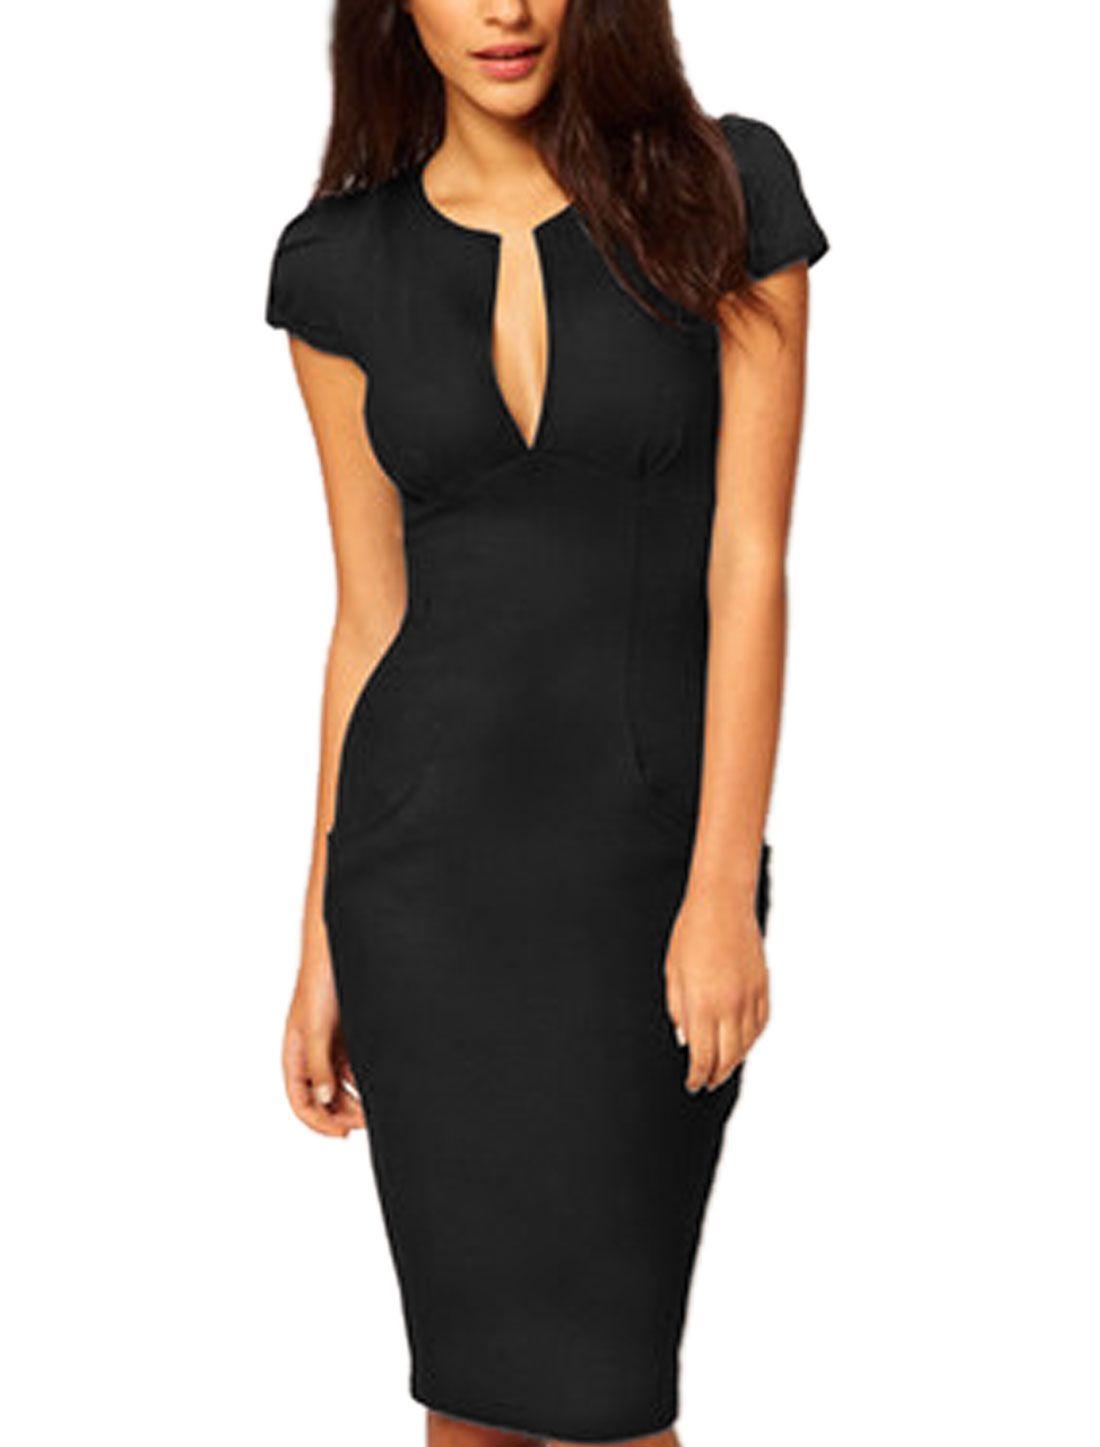 Walmart Work Dresses For Women Slim Fit Dresses Fashion [ 1447 x 1100 Pixel ]